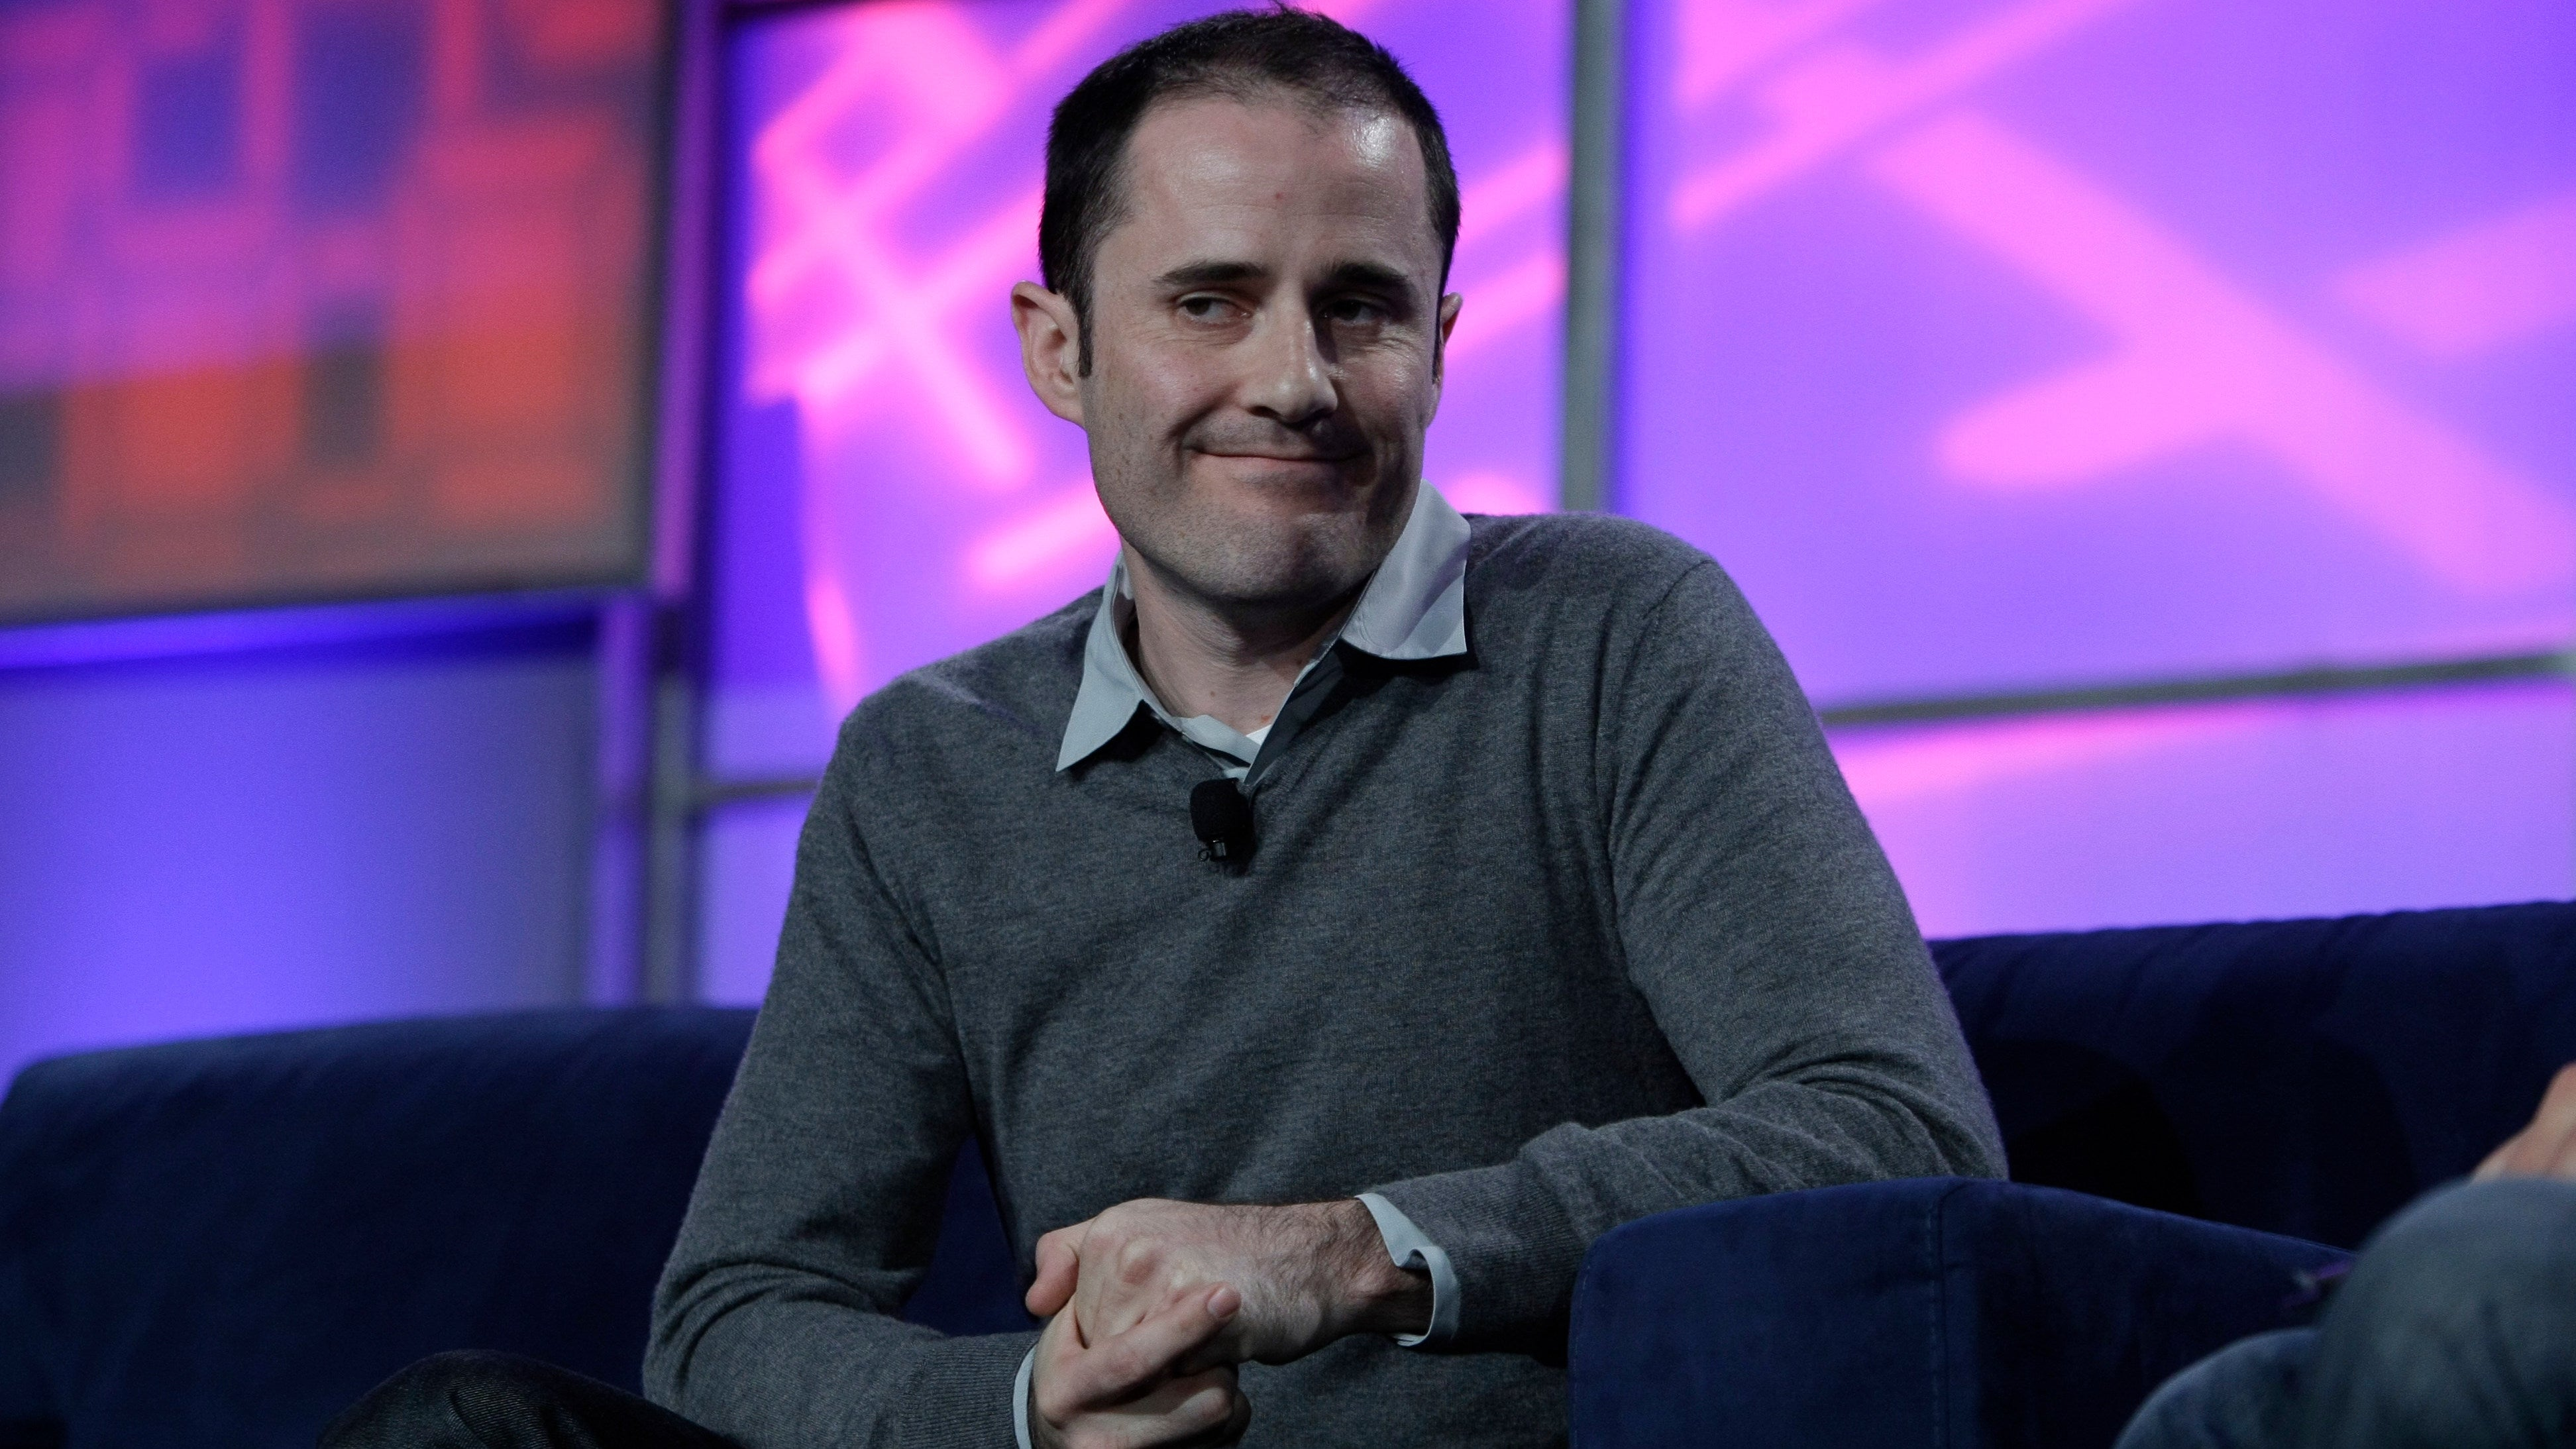 Twitter Rewards Bad Behaviour, Says Twitter Co-Founder